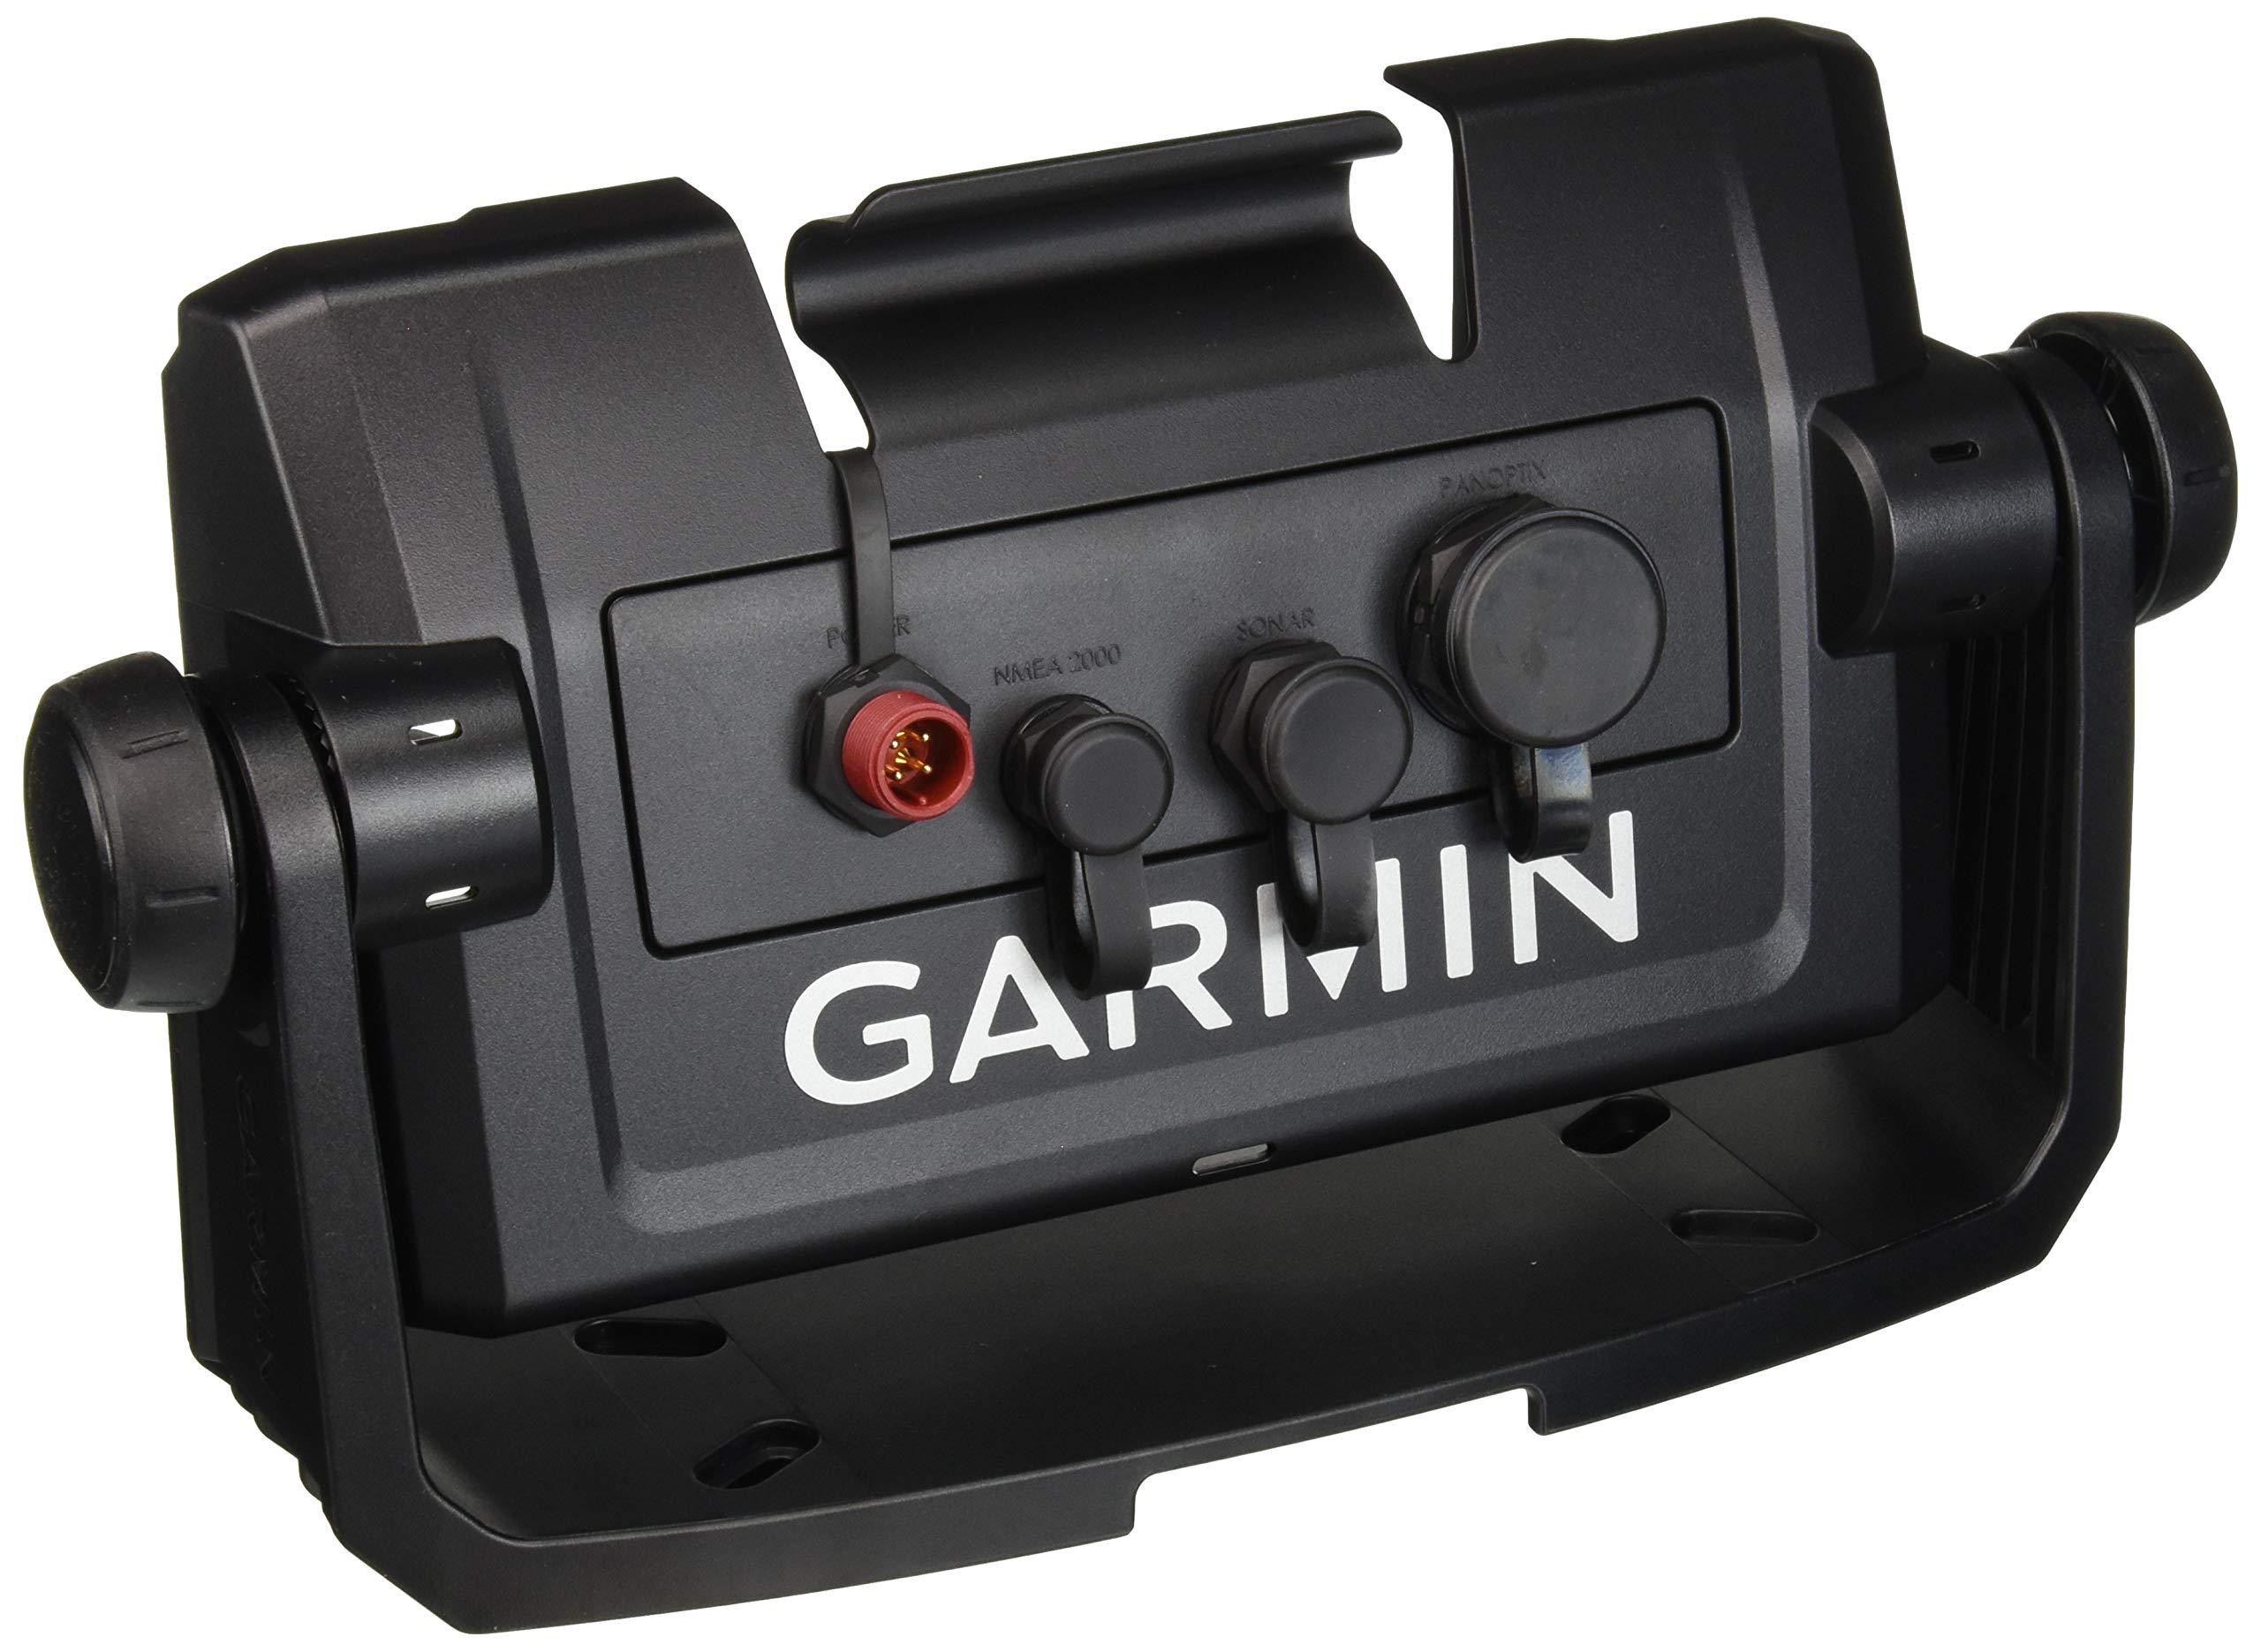 Garmin International, Inc. International, 010-12673-03 Garmin Quick Mount Echomap Plus by Garmin International, Inc.